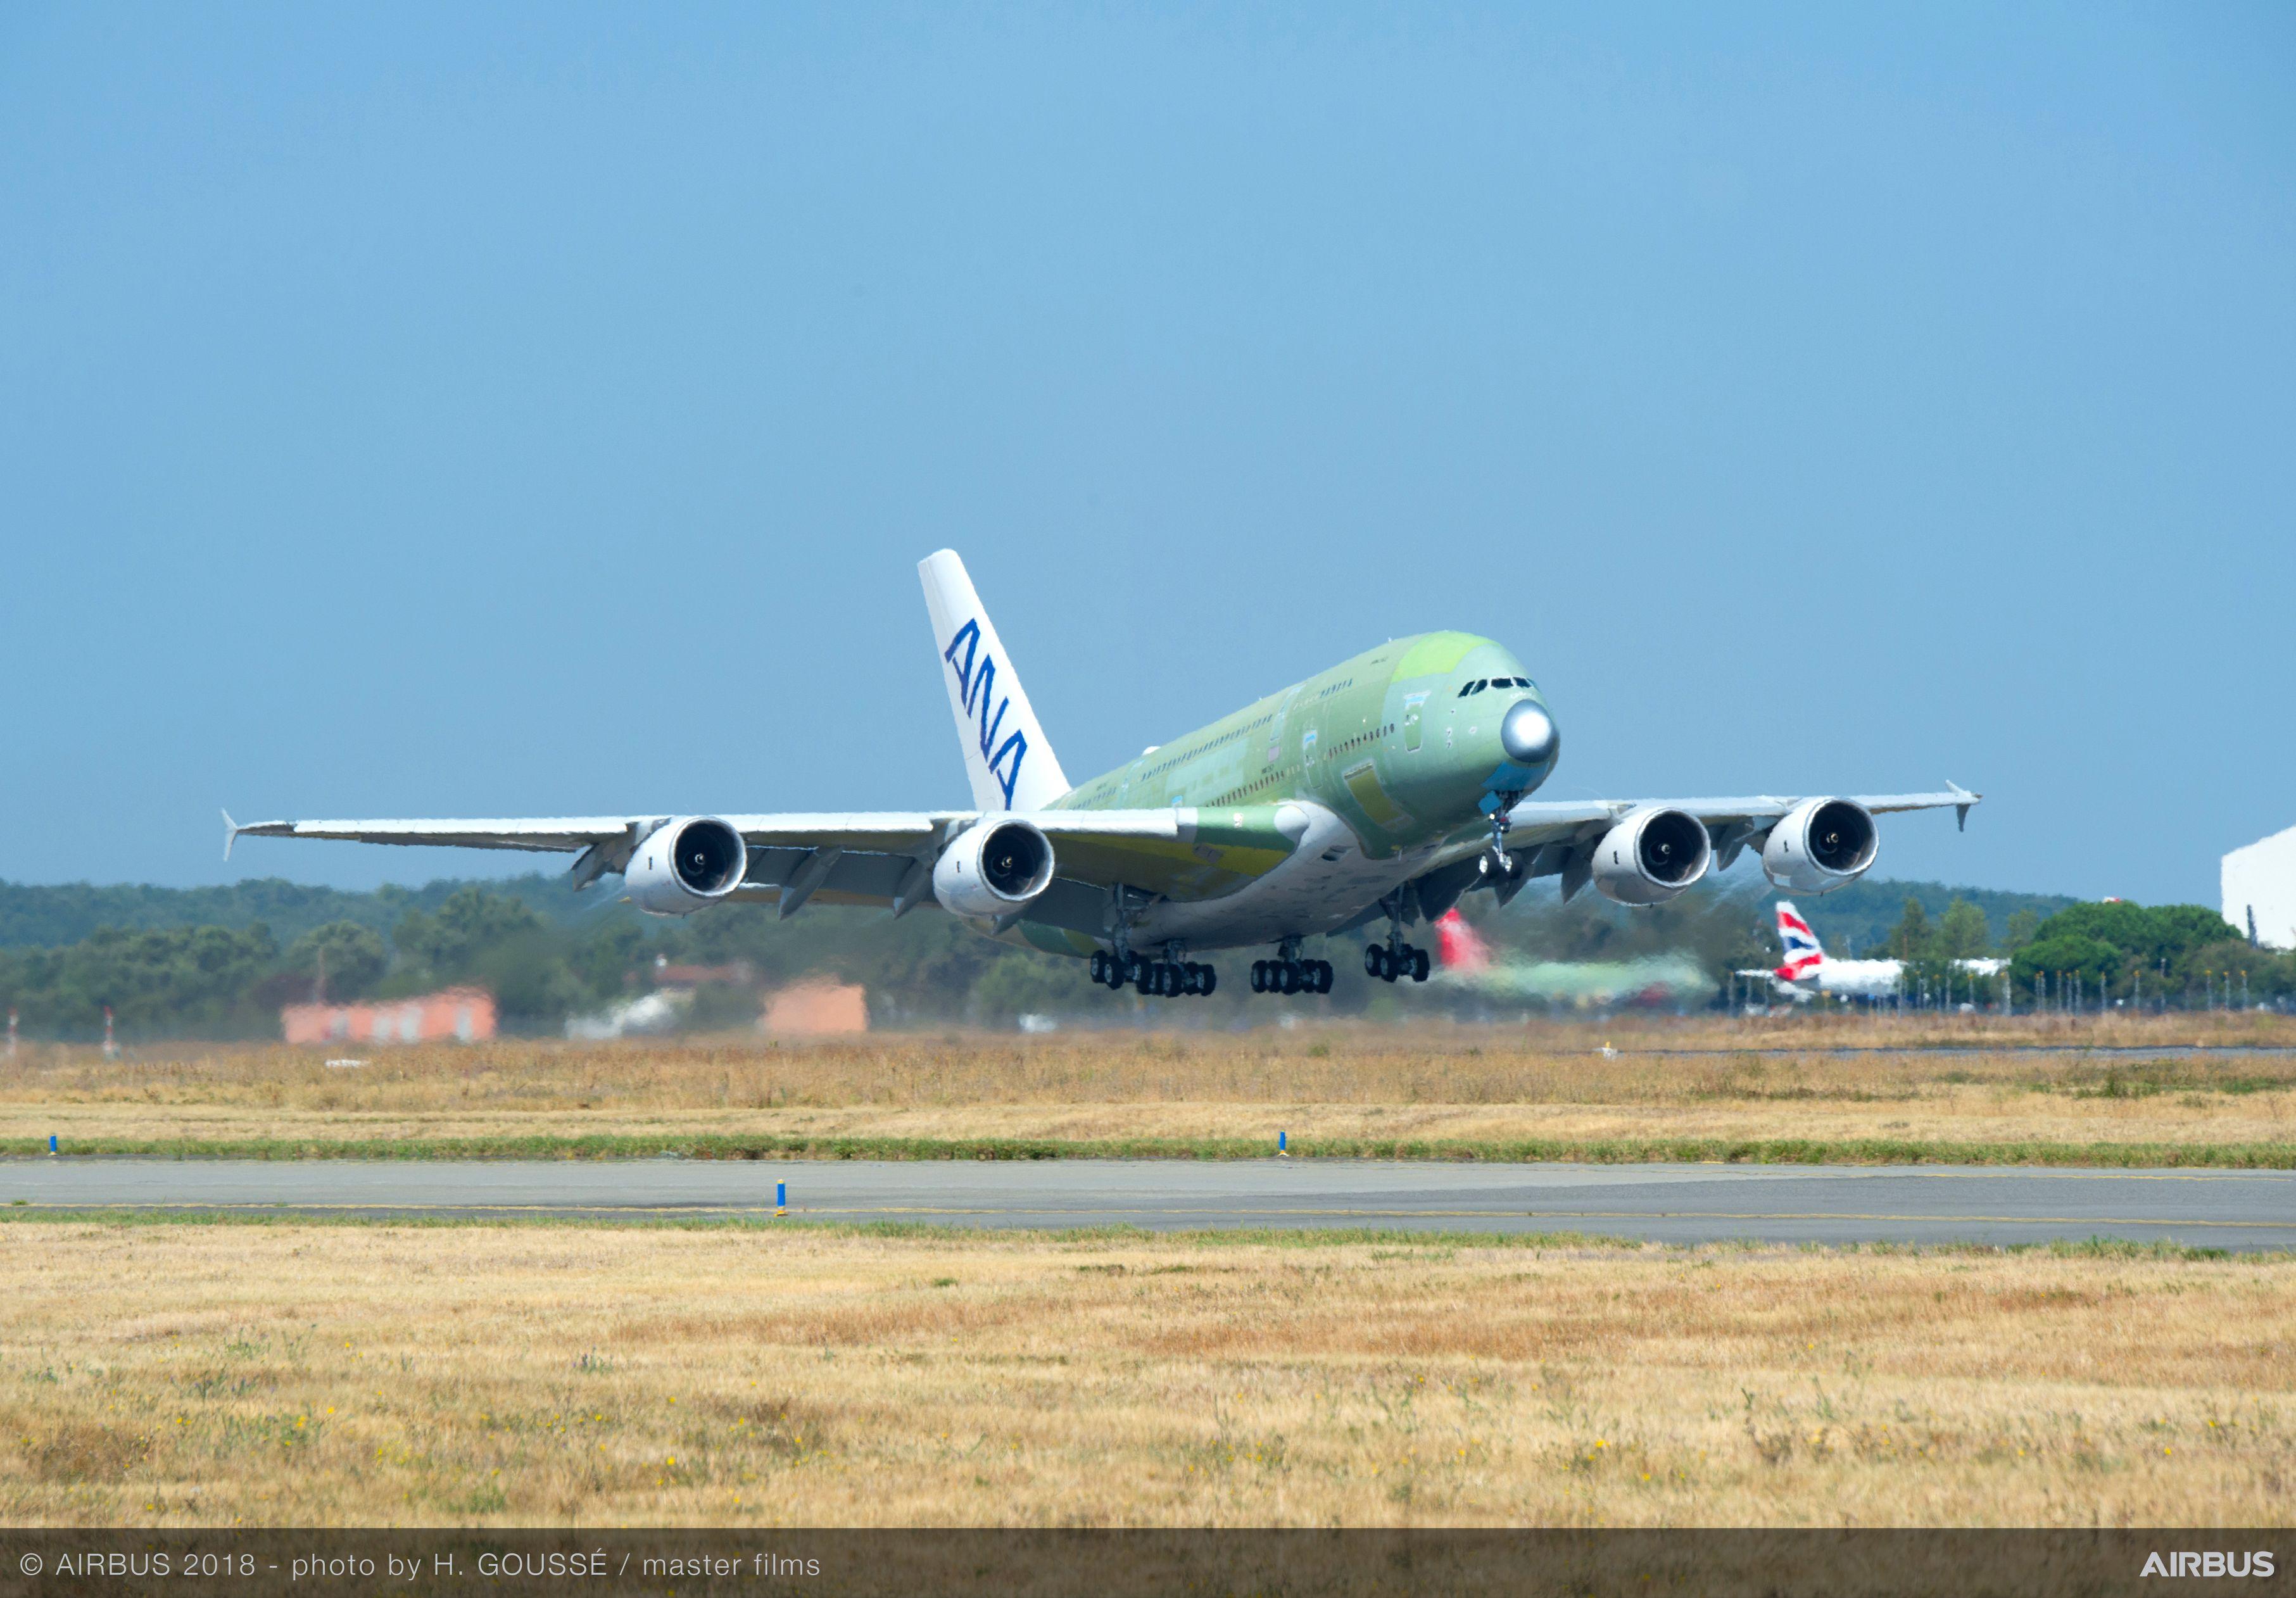 All Nippon Airways' første Airbus A380 letter fra samlefabrikken i franske Toulouse med kurs mod Hamborg. Foto: Airbus